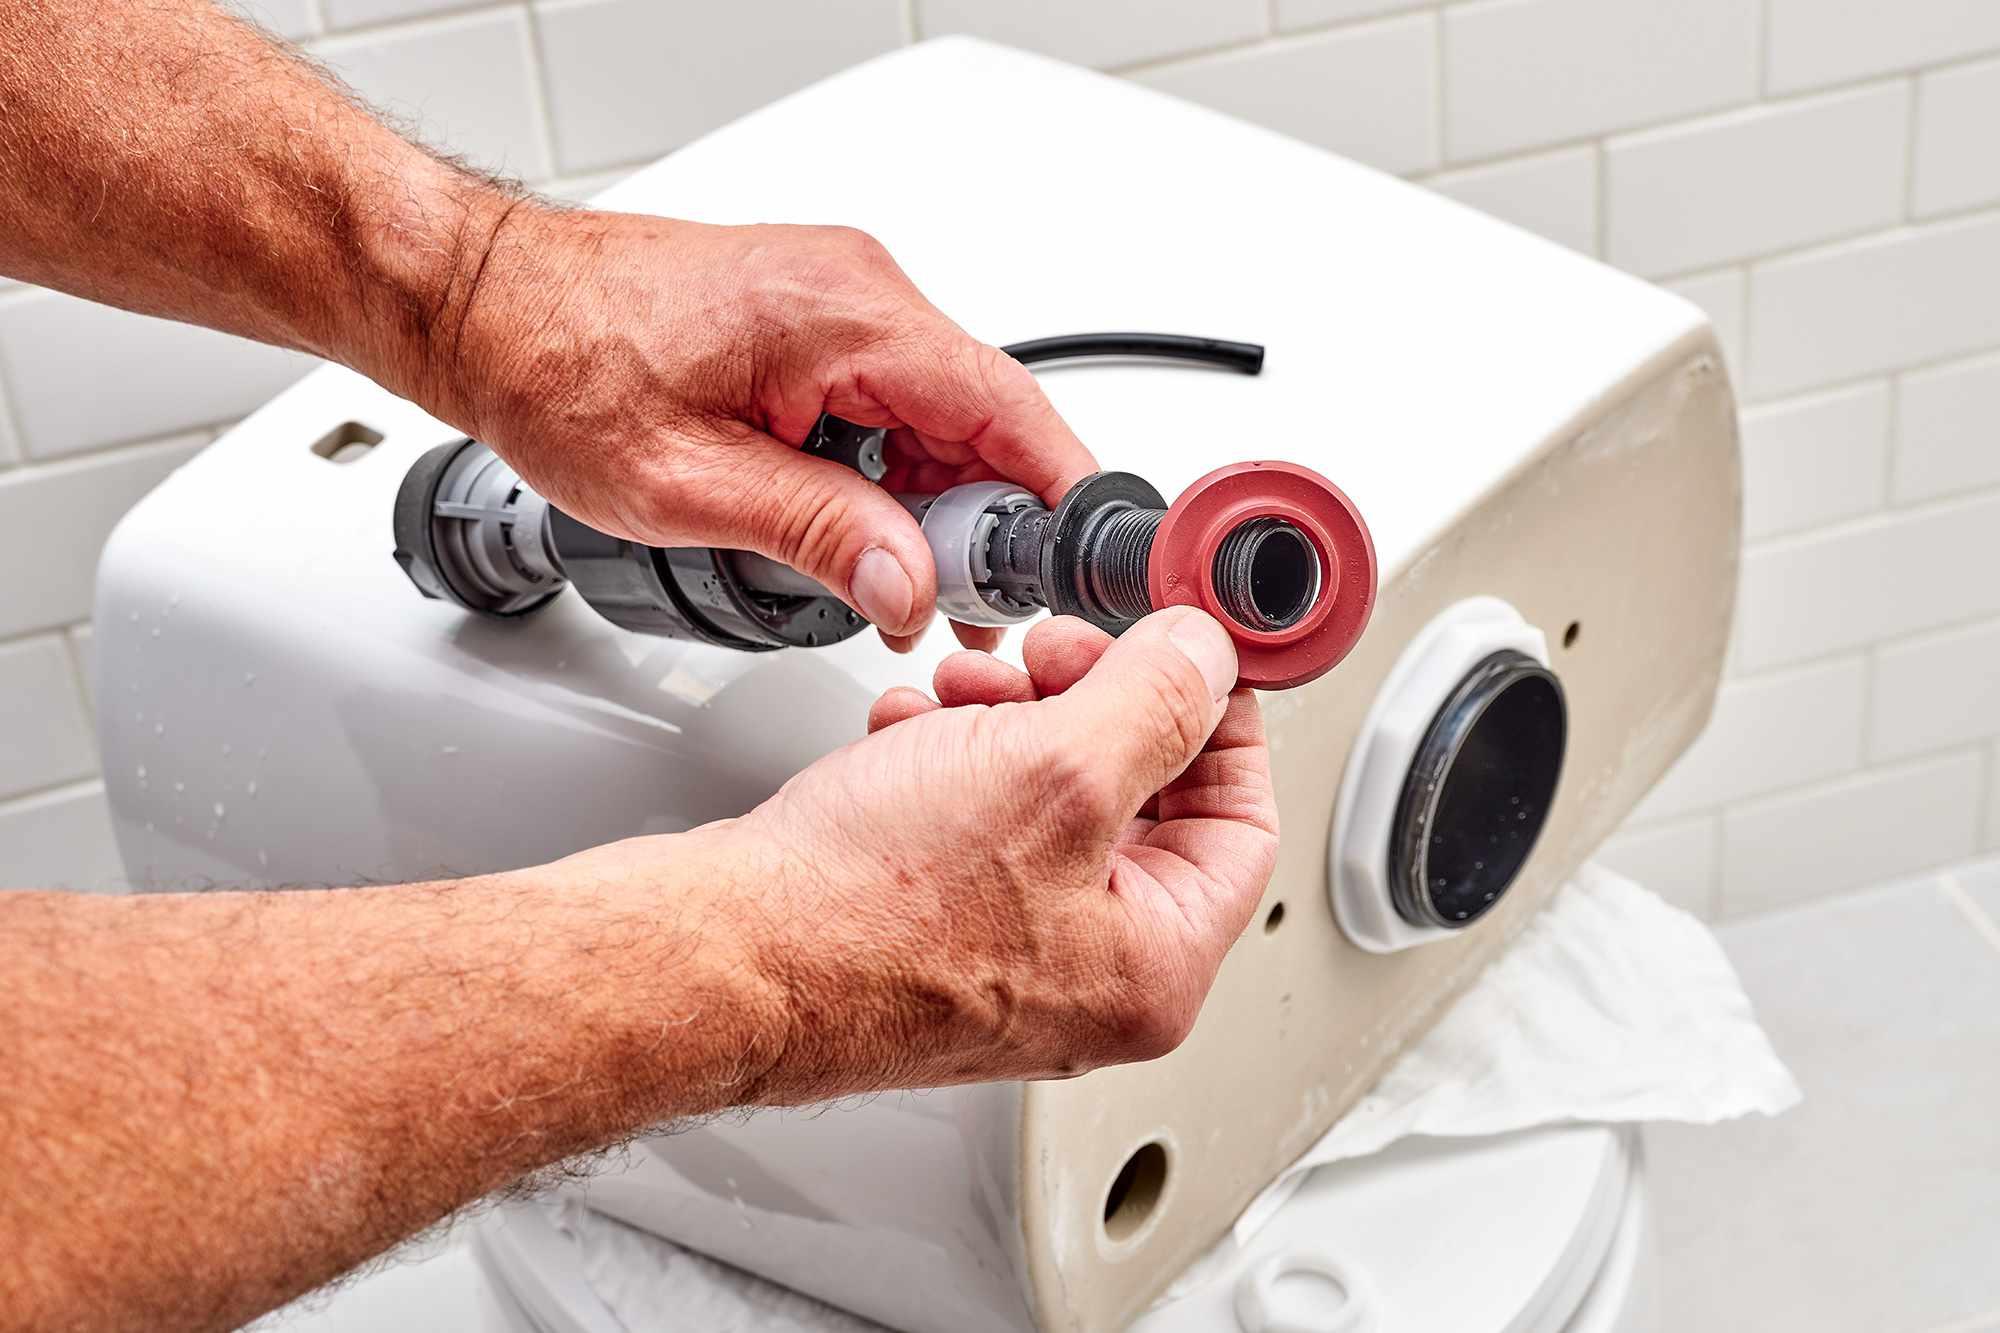 Red beveled washer slid onto tailpiece of flush valve